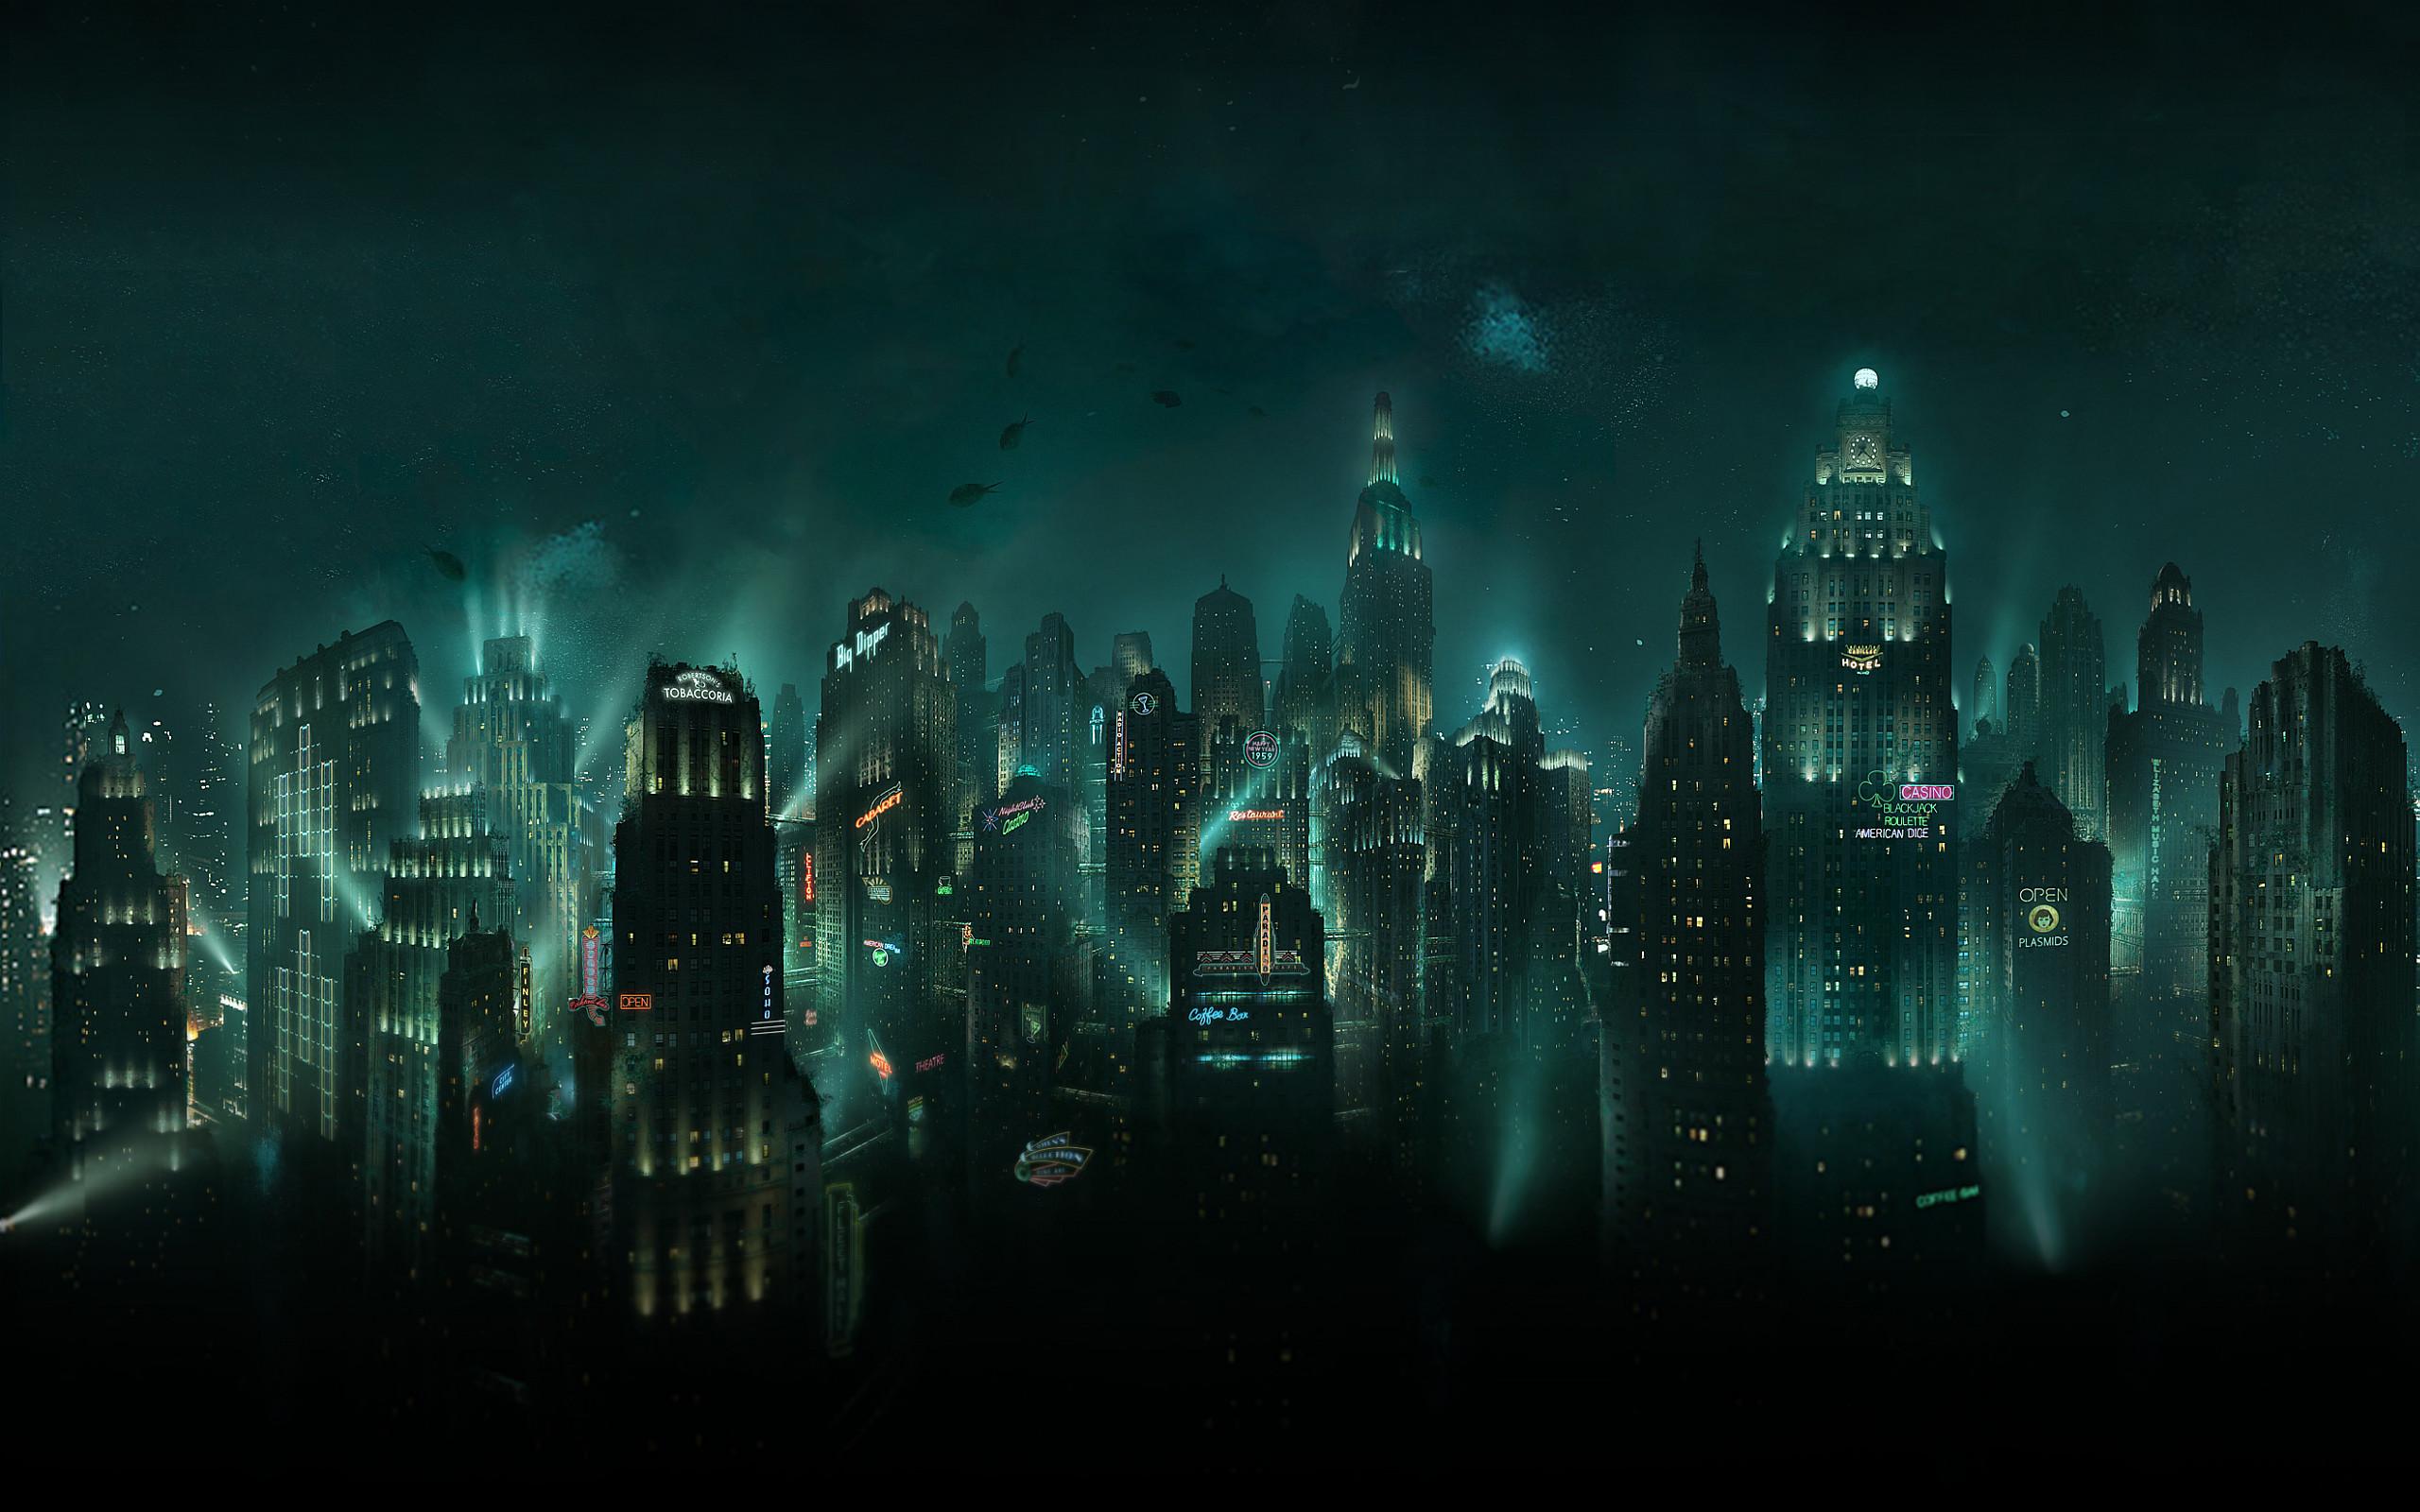 Free bioshock Video Game wallpaper background